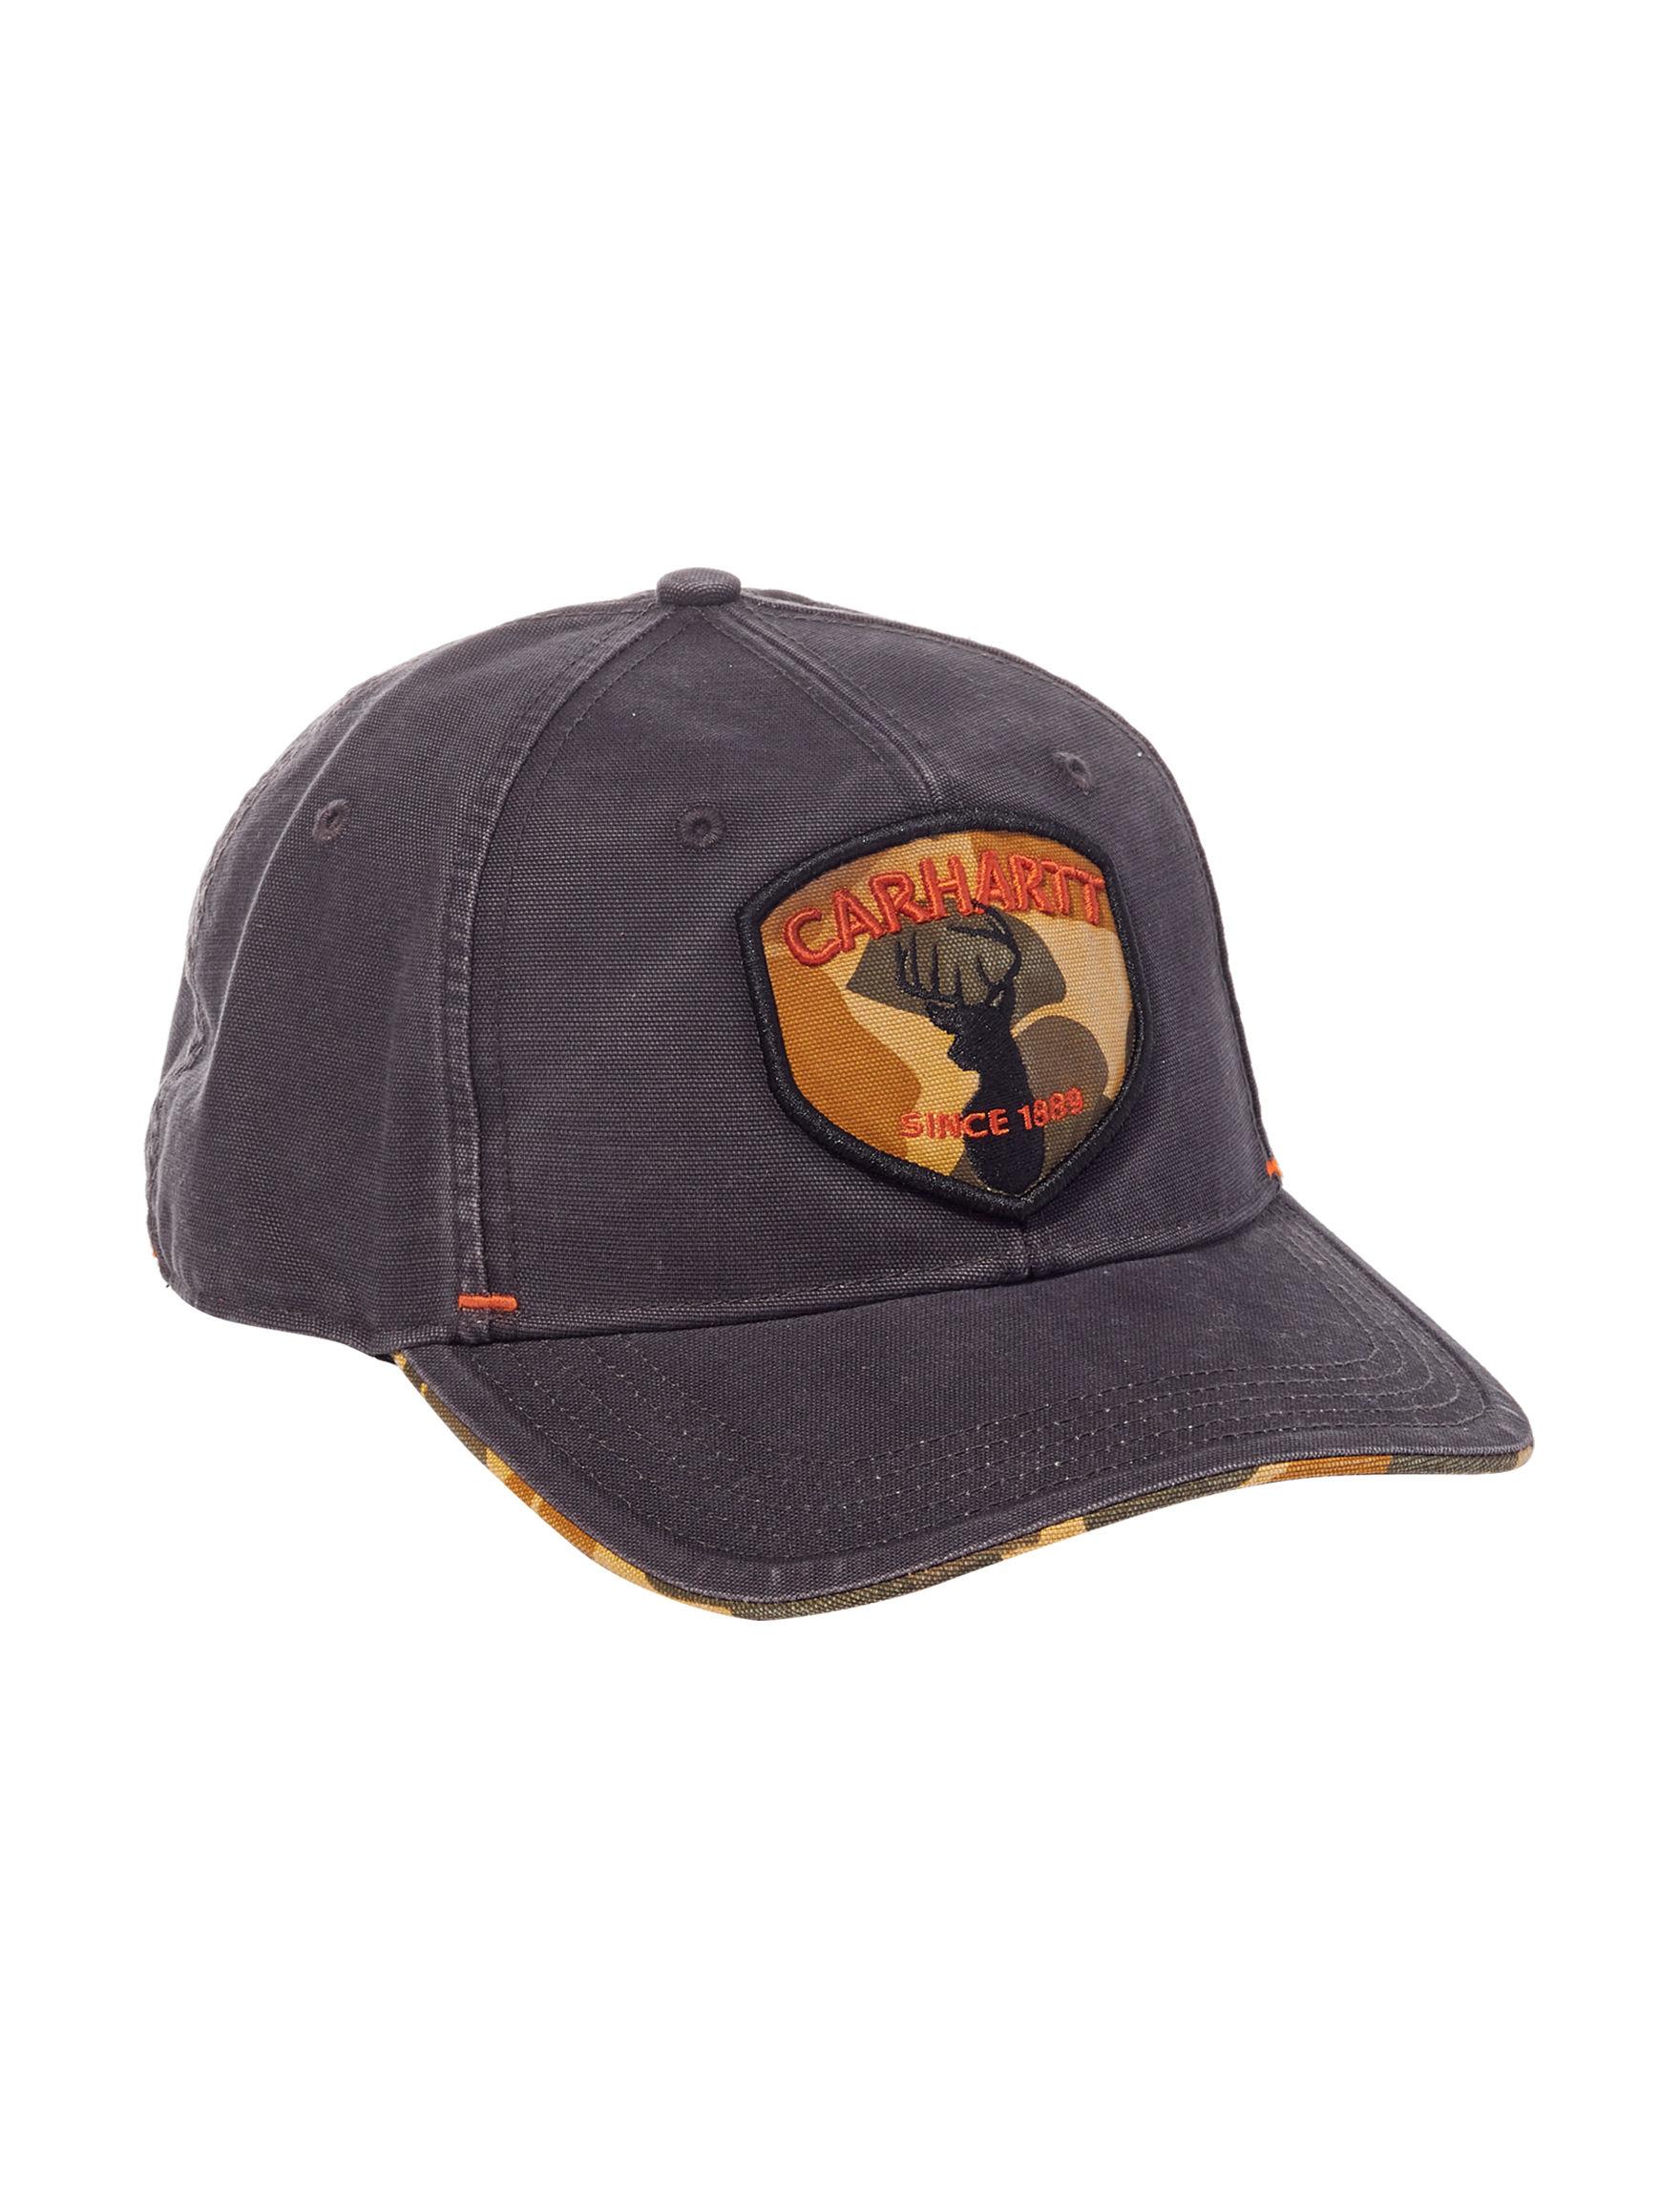 Carhartt Black Hats & Headwear Baseball Caps